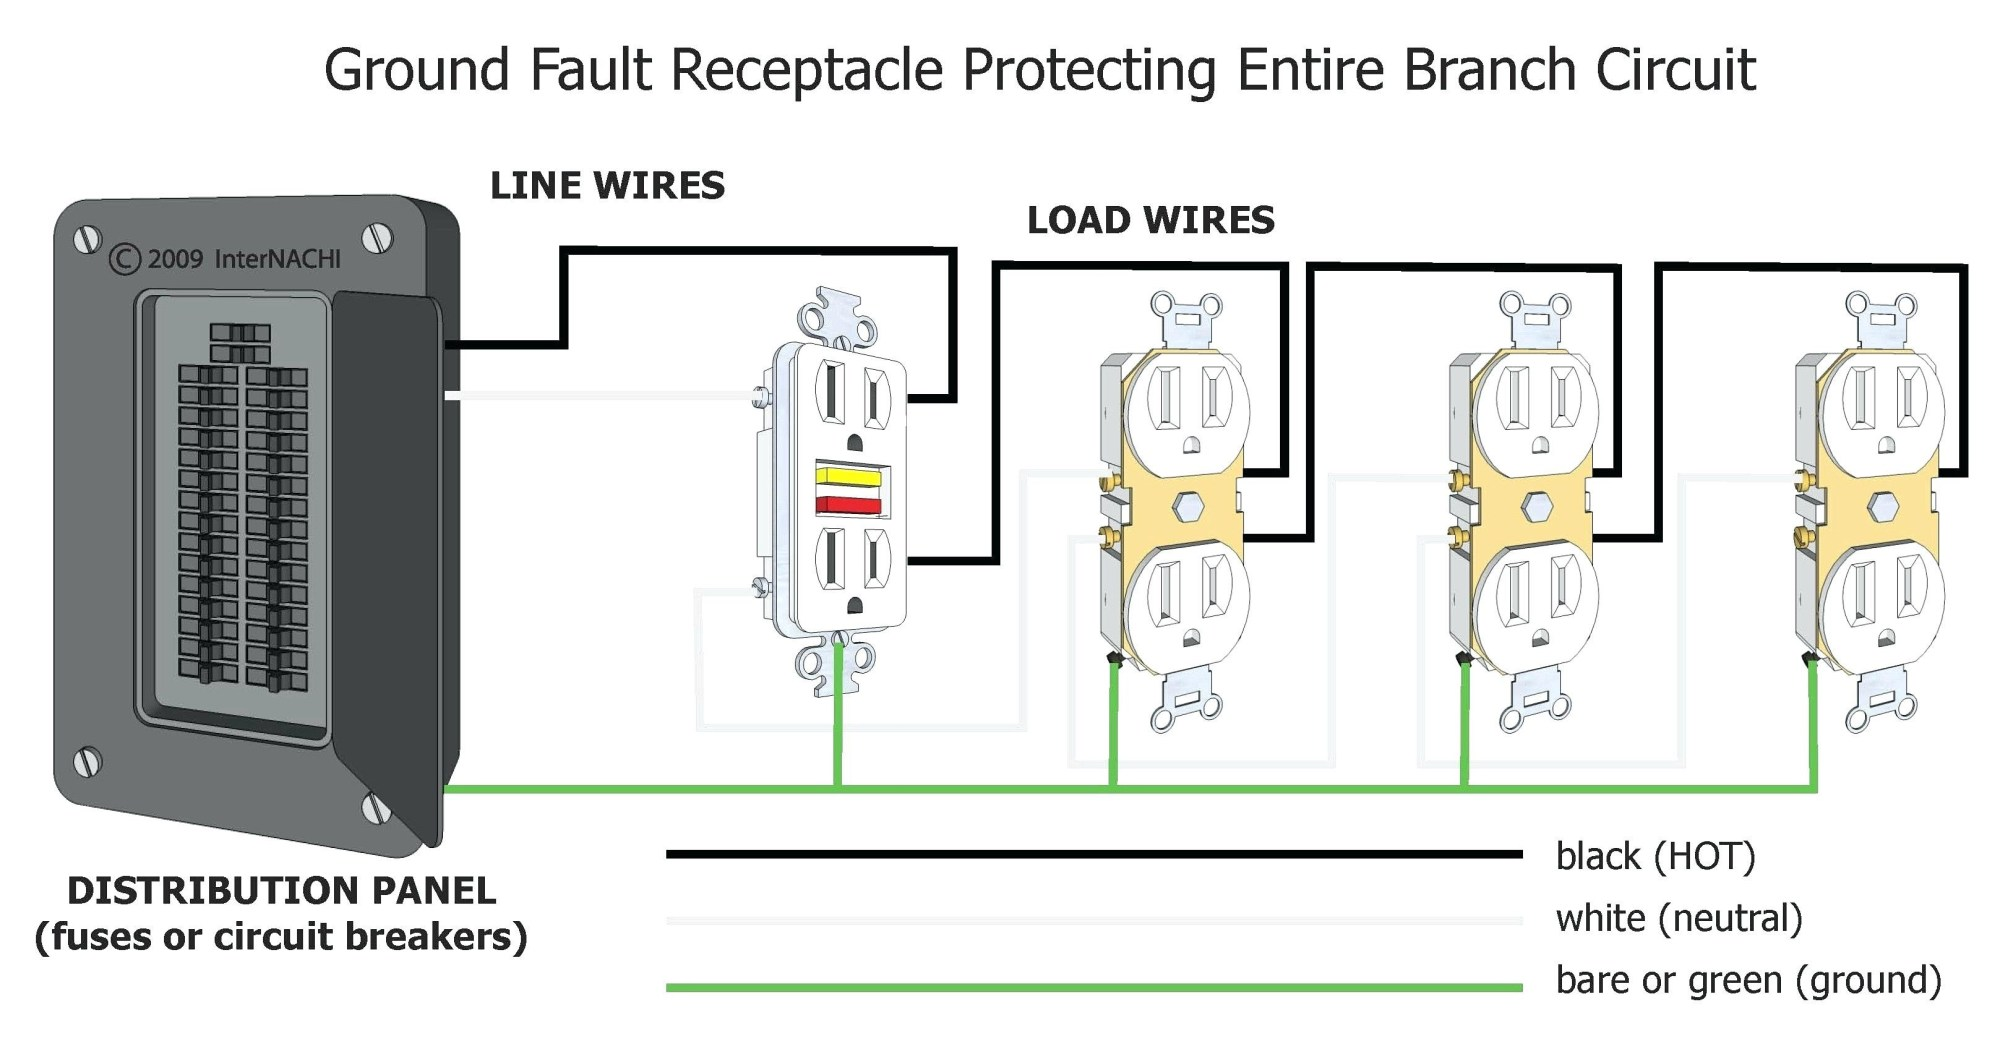 hight resolution of homeline breaker box wiring diagram collection wiring diagram for 30 amp breaker box inspirationa homeline